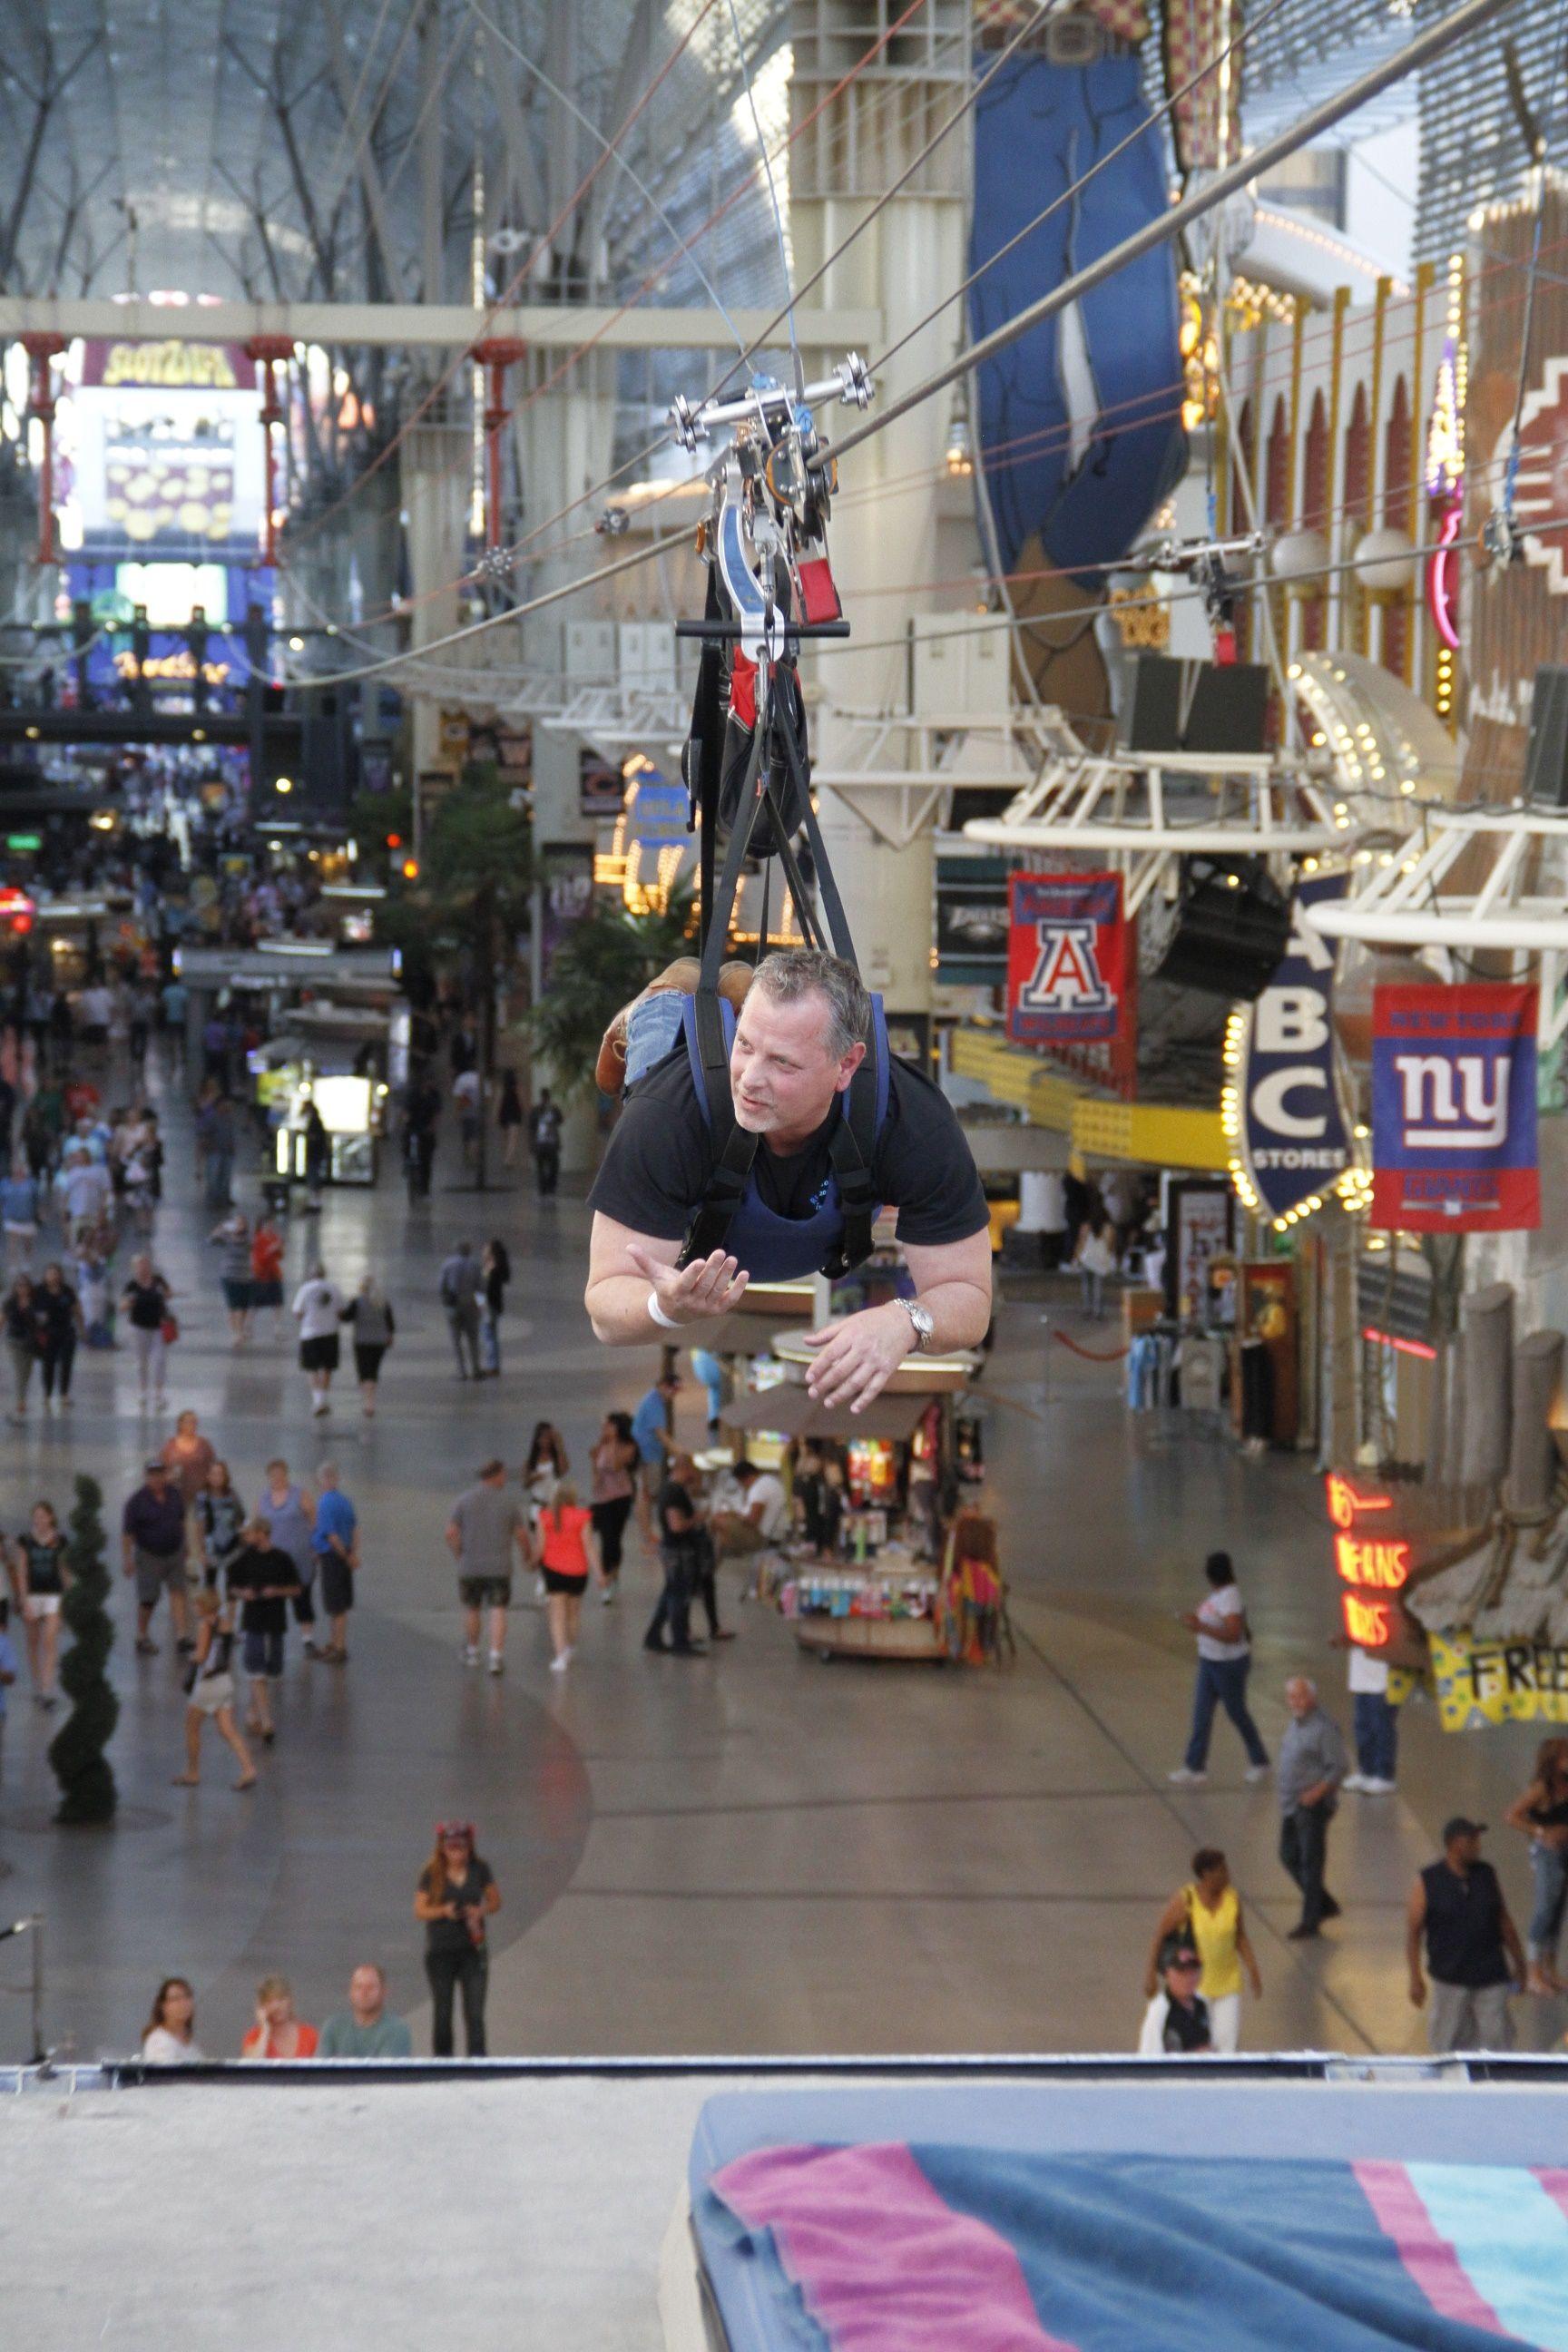 Ziplining at RightSourcing's 2015 Summit in Las Vegas, NV